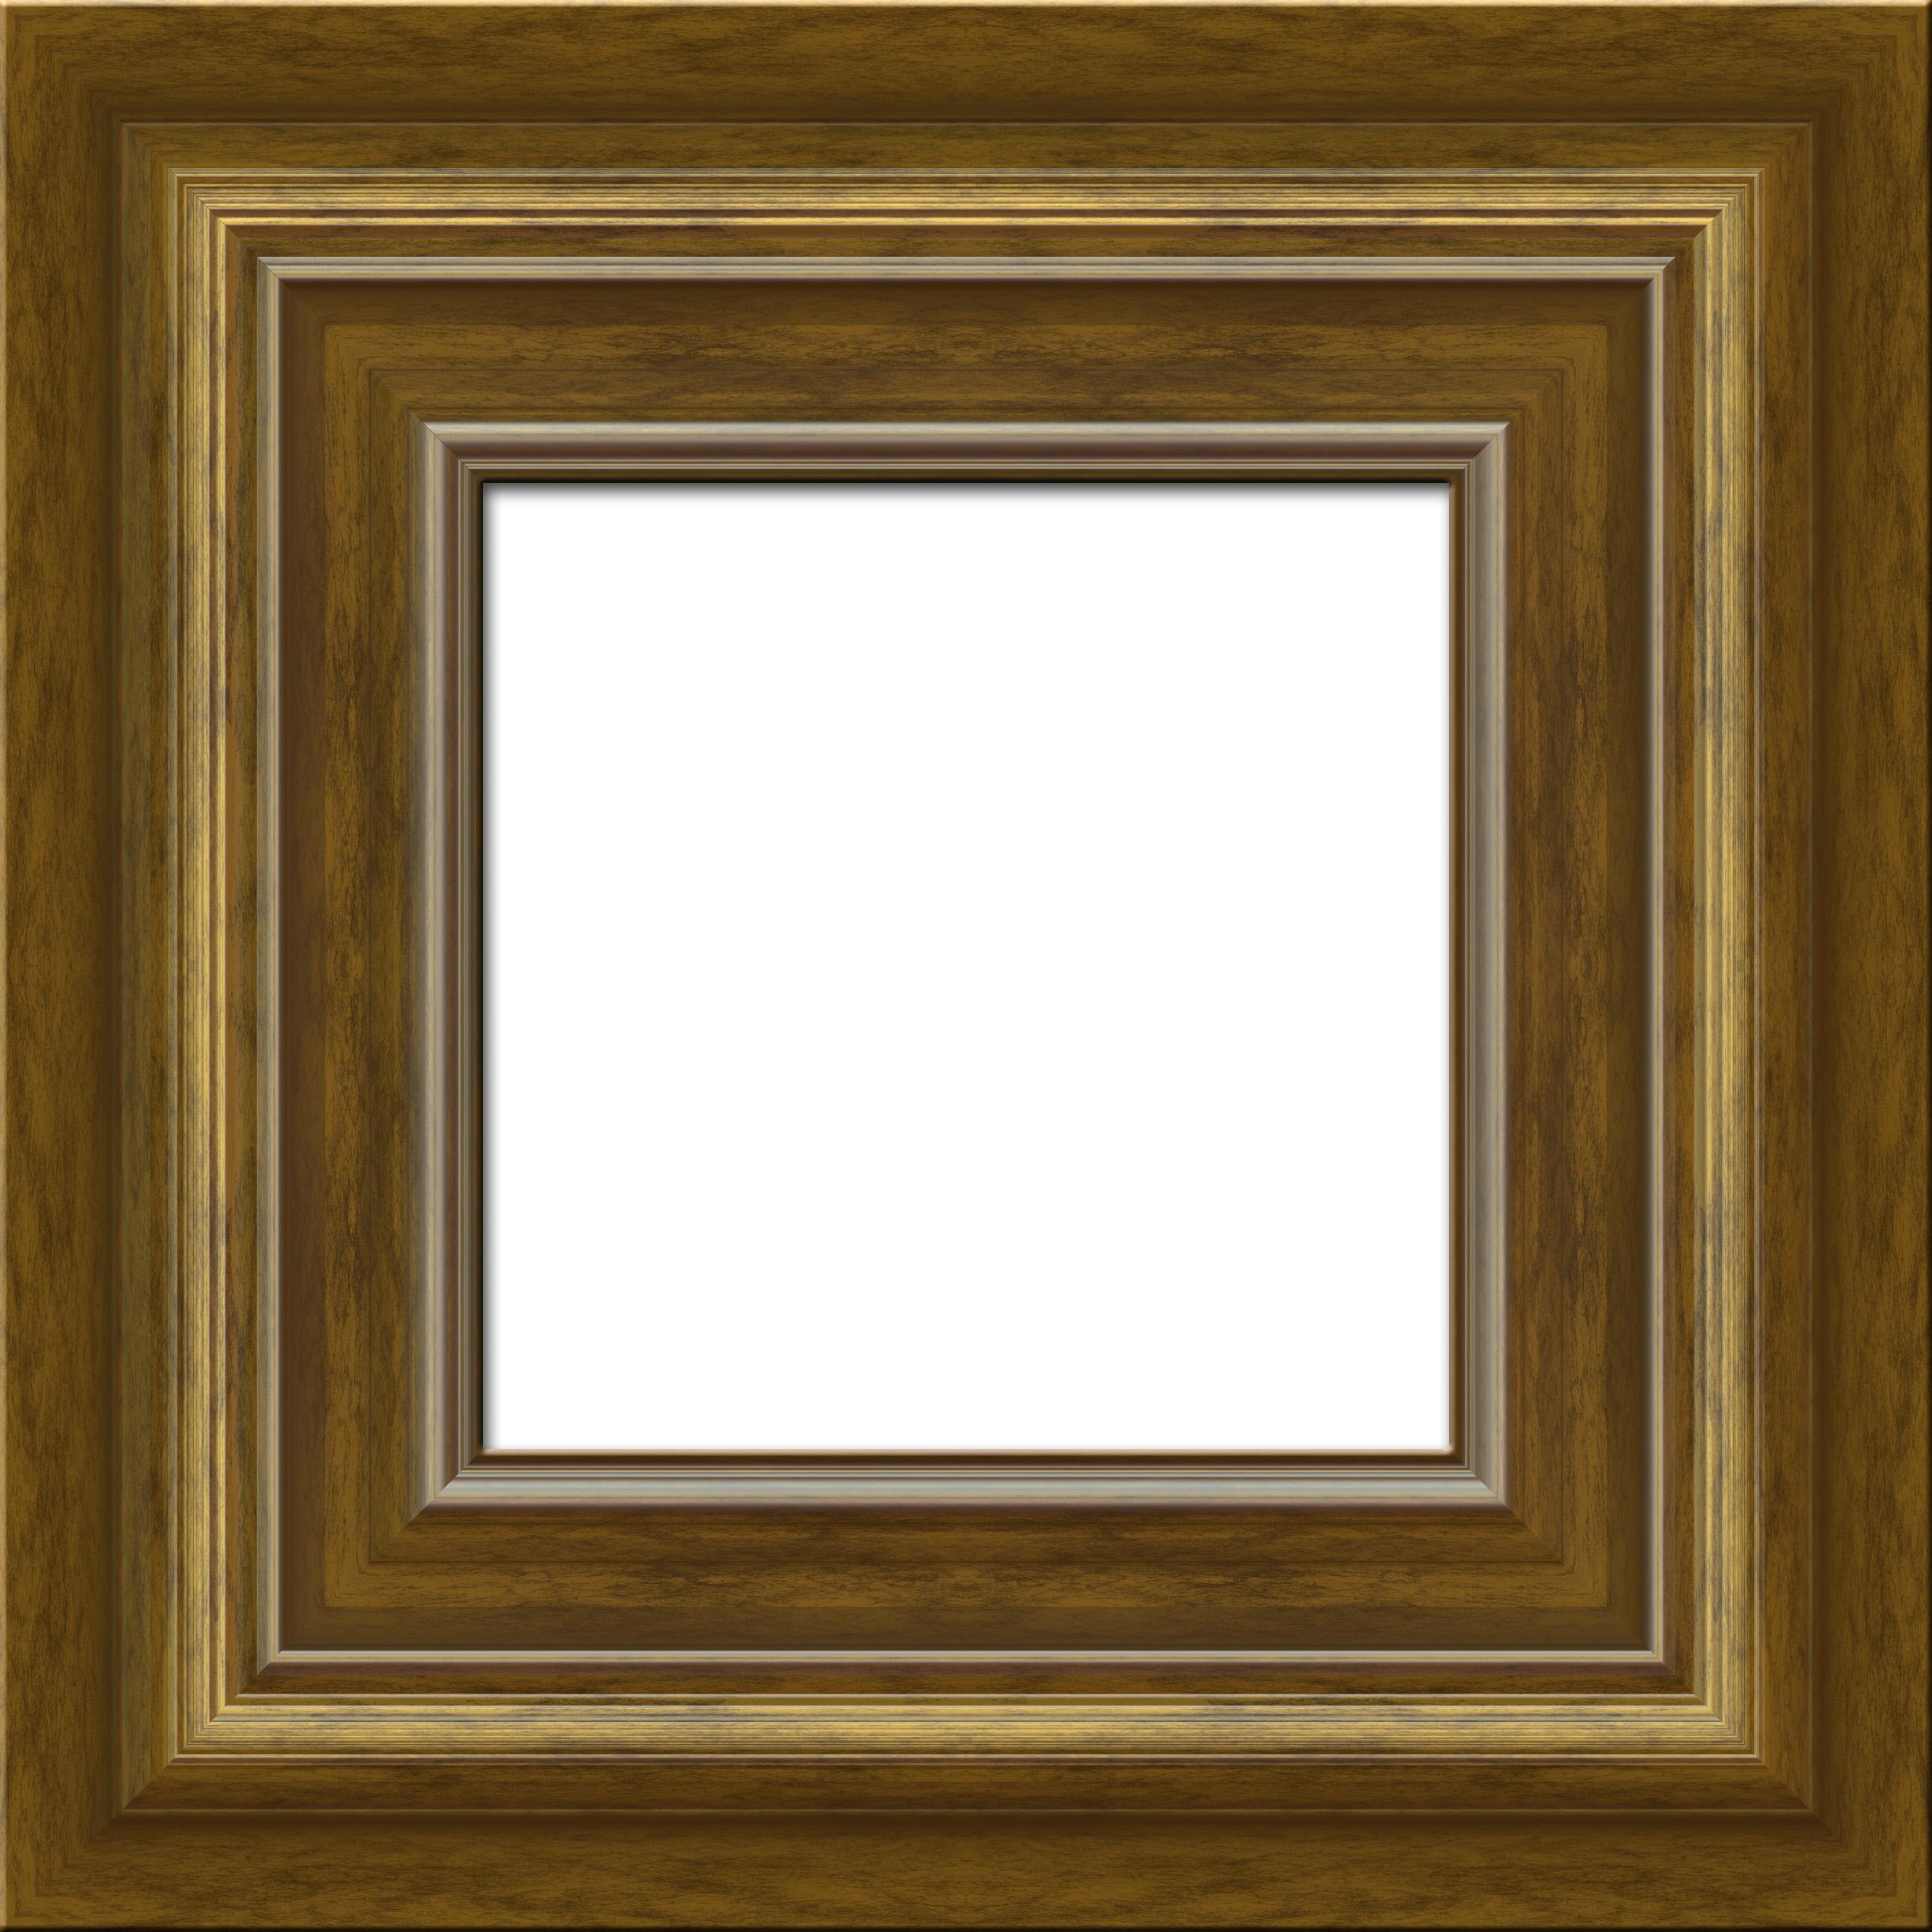 Bojan Živković - Free Old Wood Frames